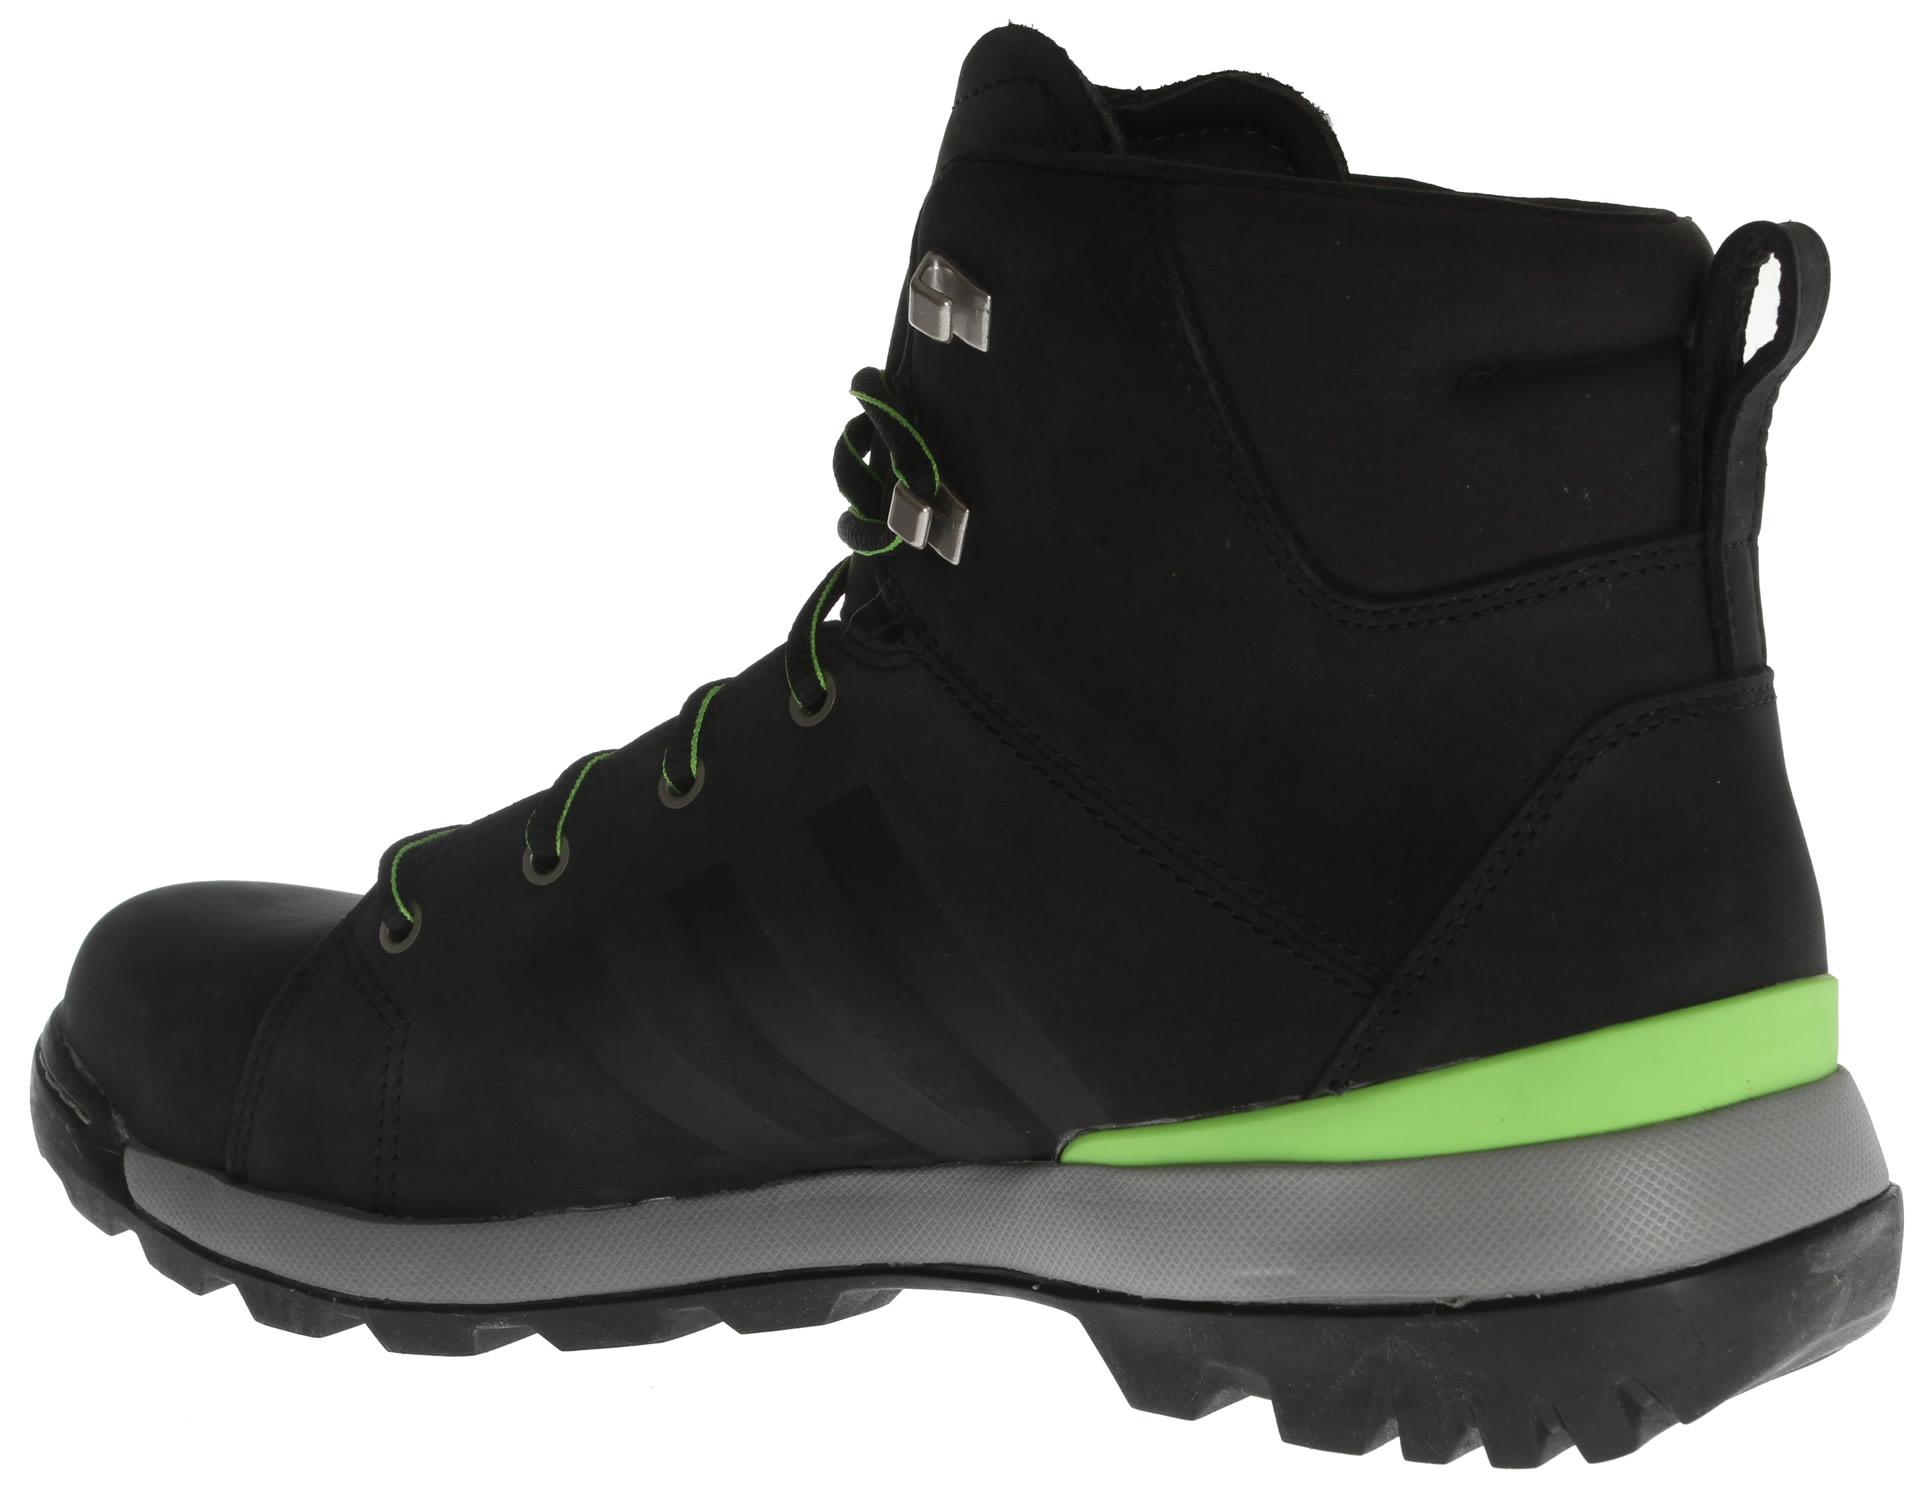 Adidas Trail Cruiser Mid Hiking Boots